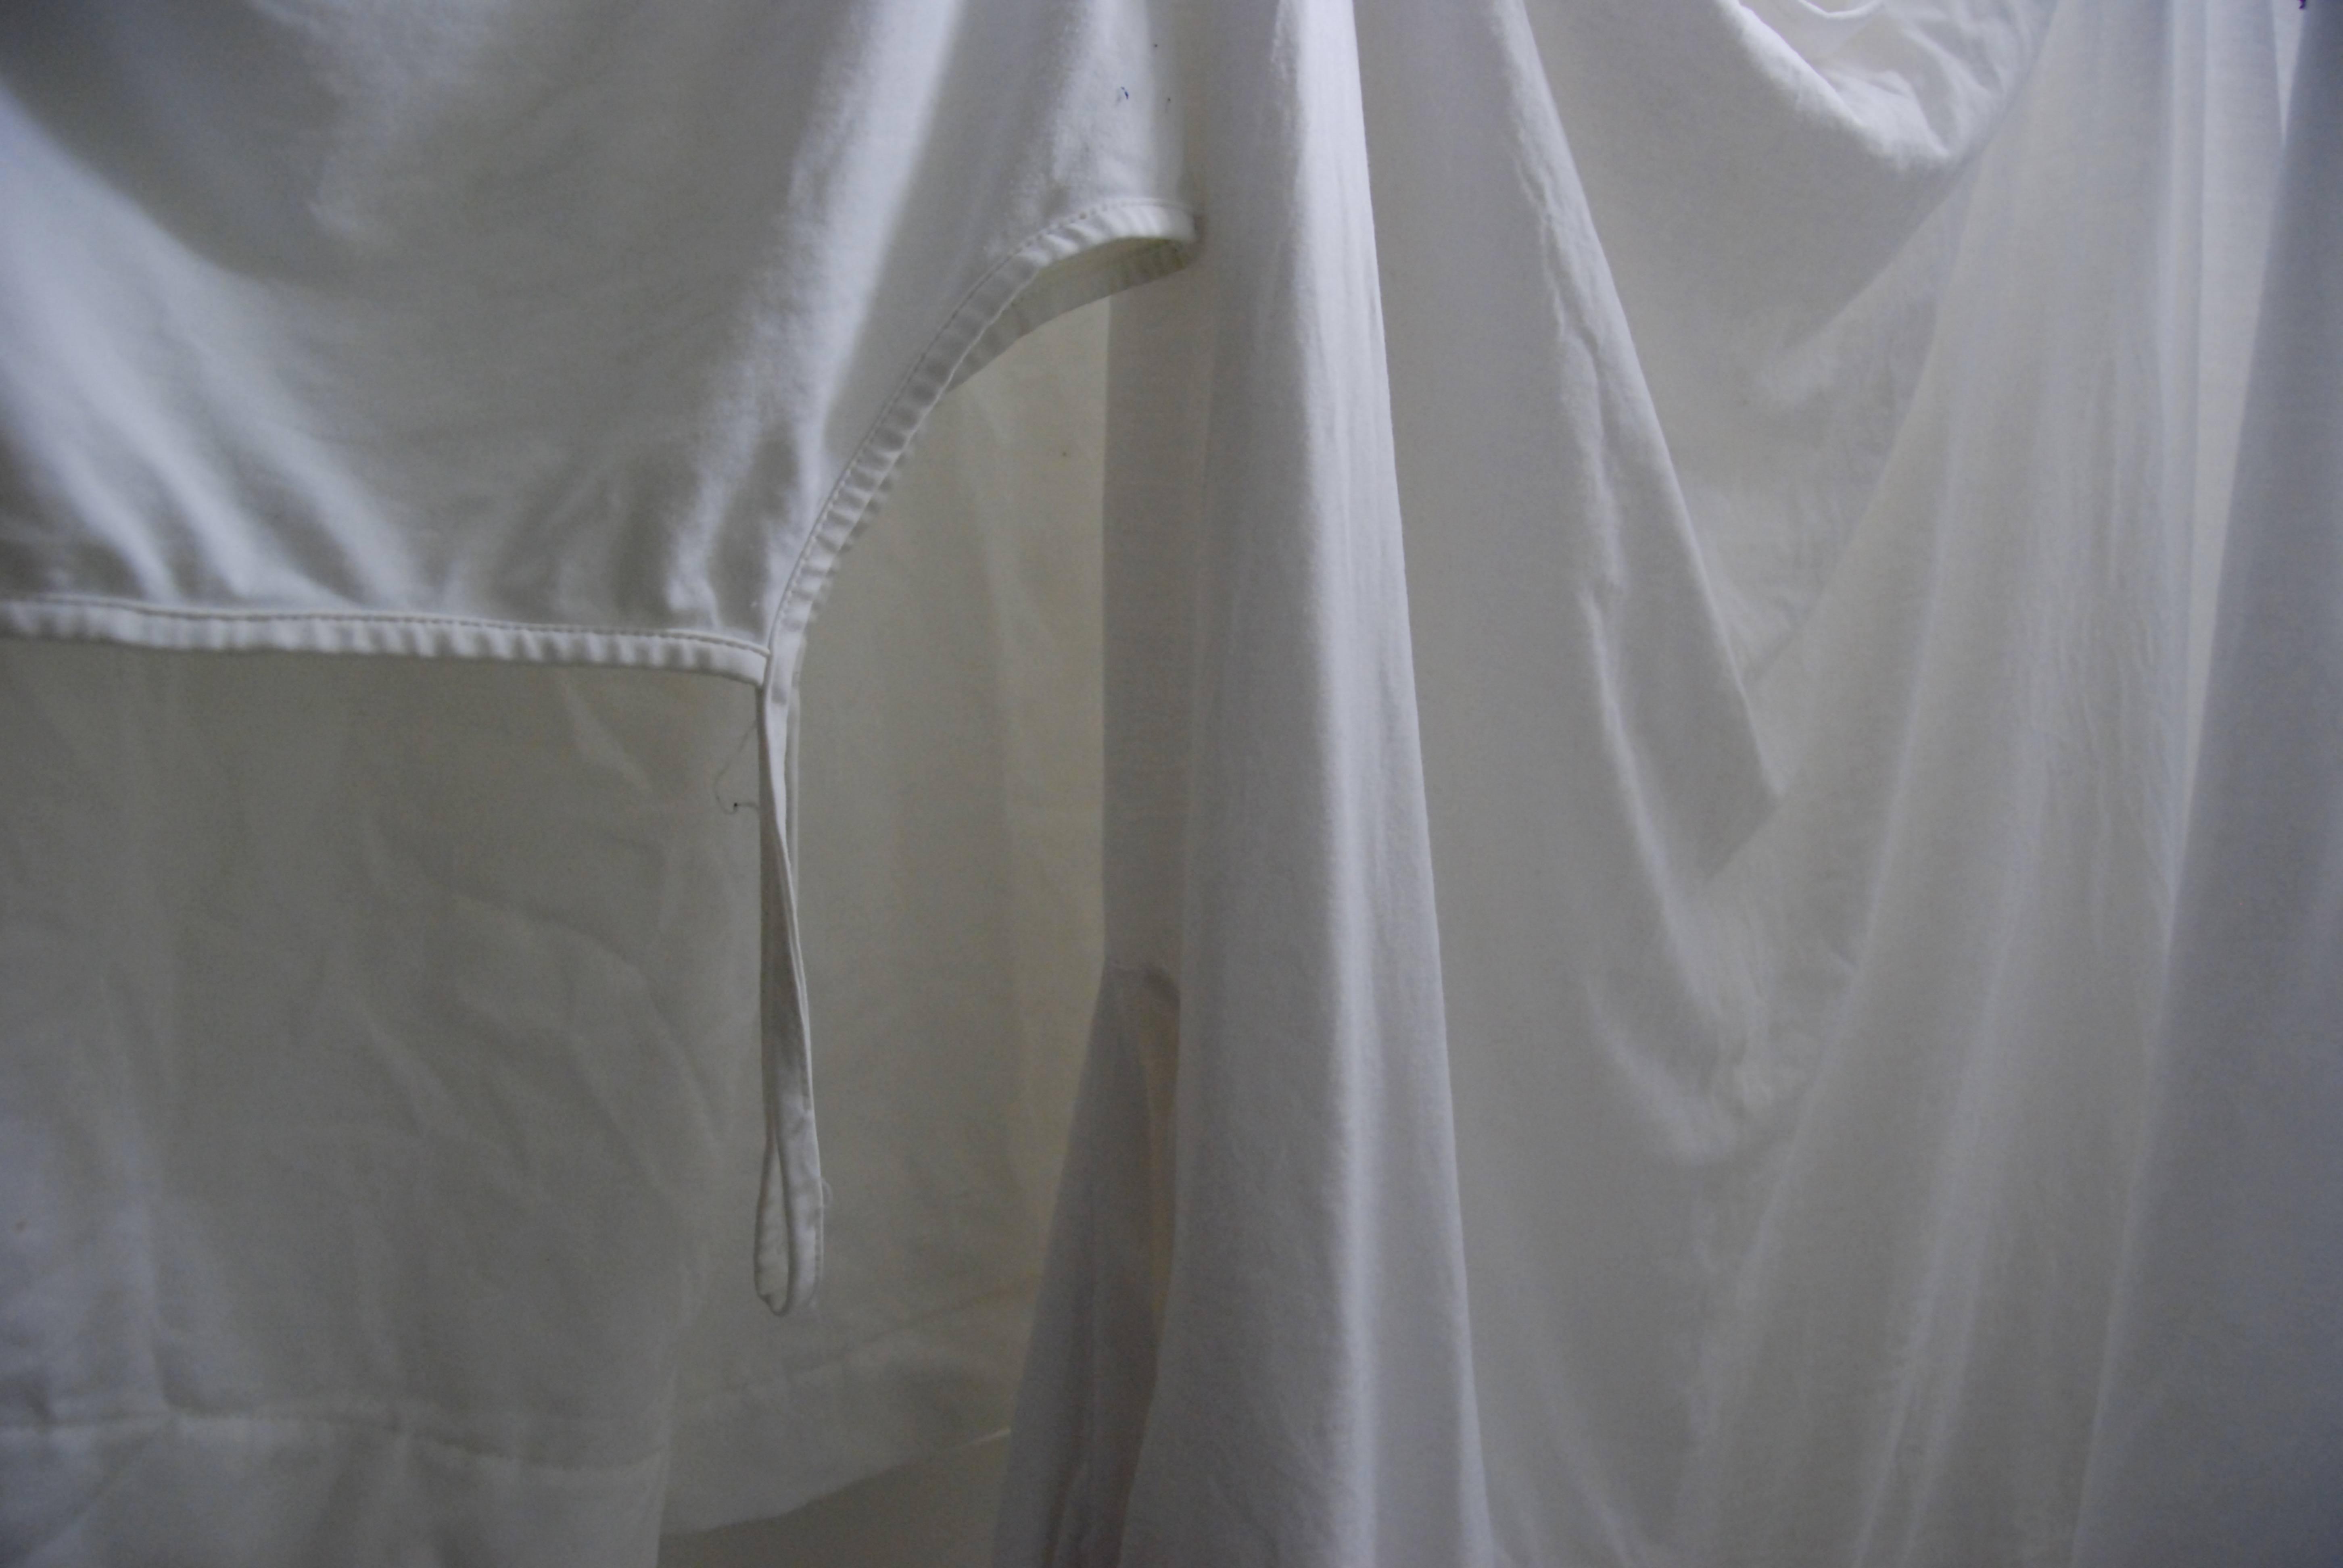 White Laundry Drying